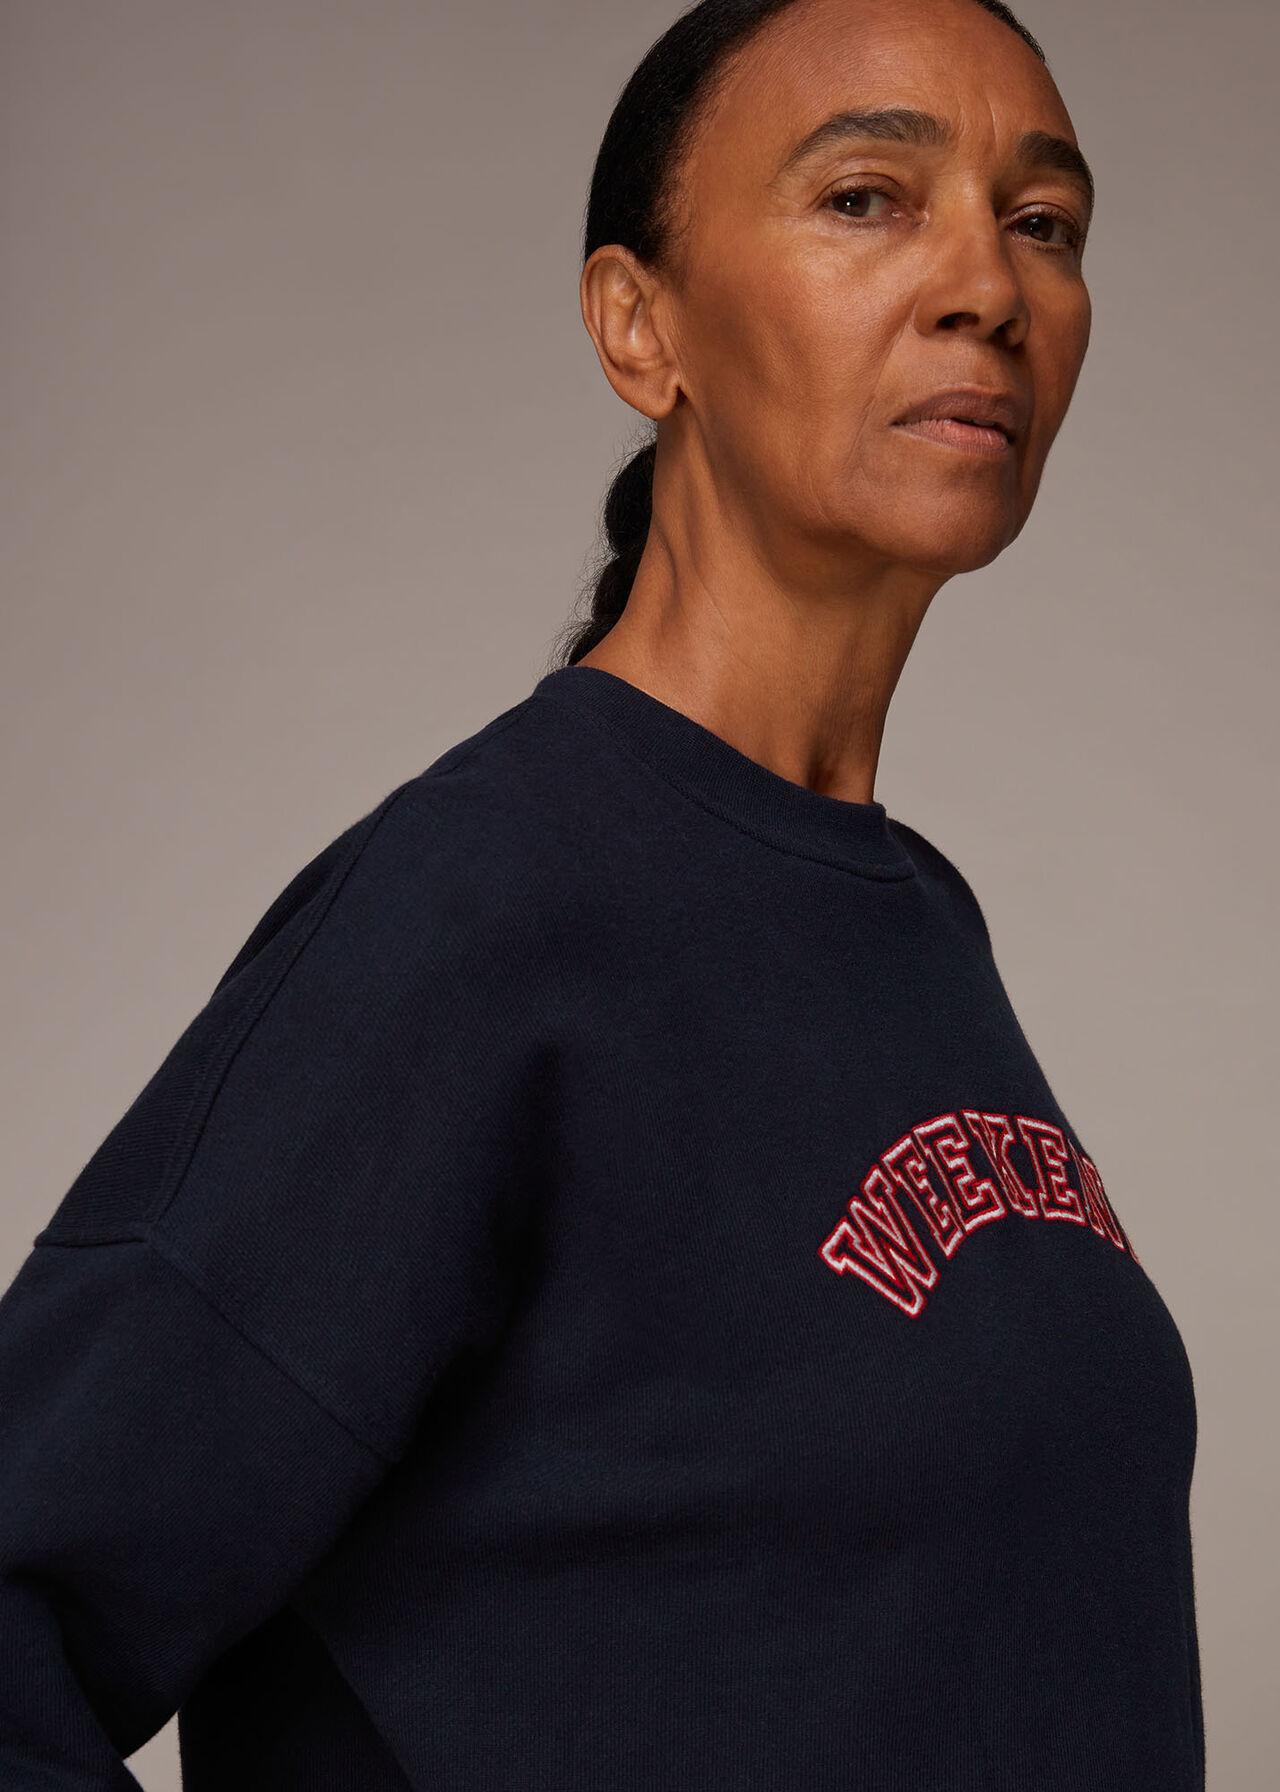 Weekend Sweatshirt